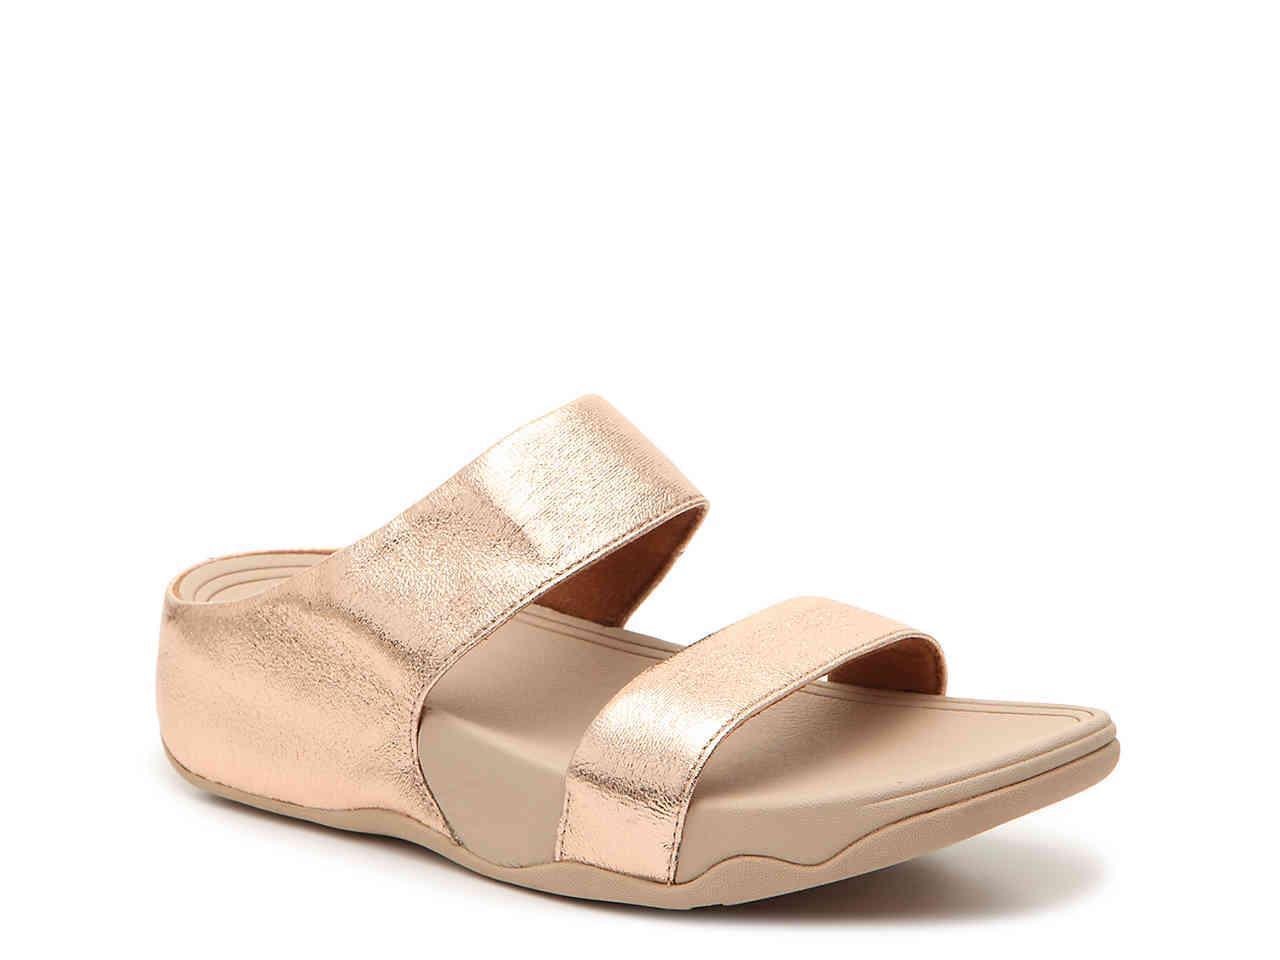 f3acc051316 Lyst - Fitflop Lulu Glitzy Wedge Sandal in Metallic